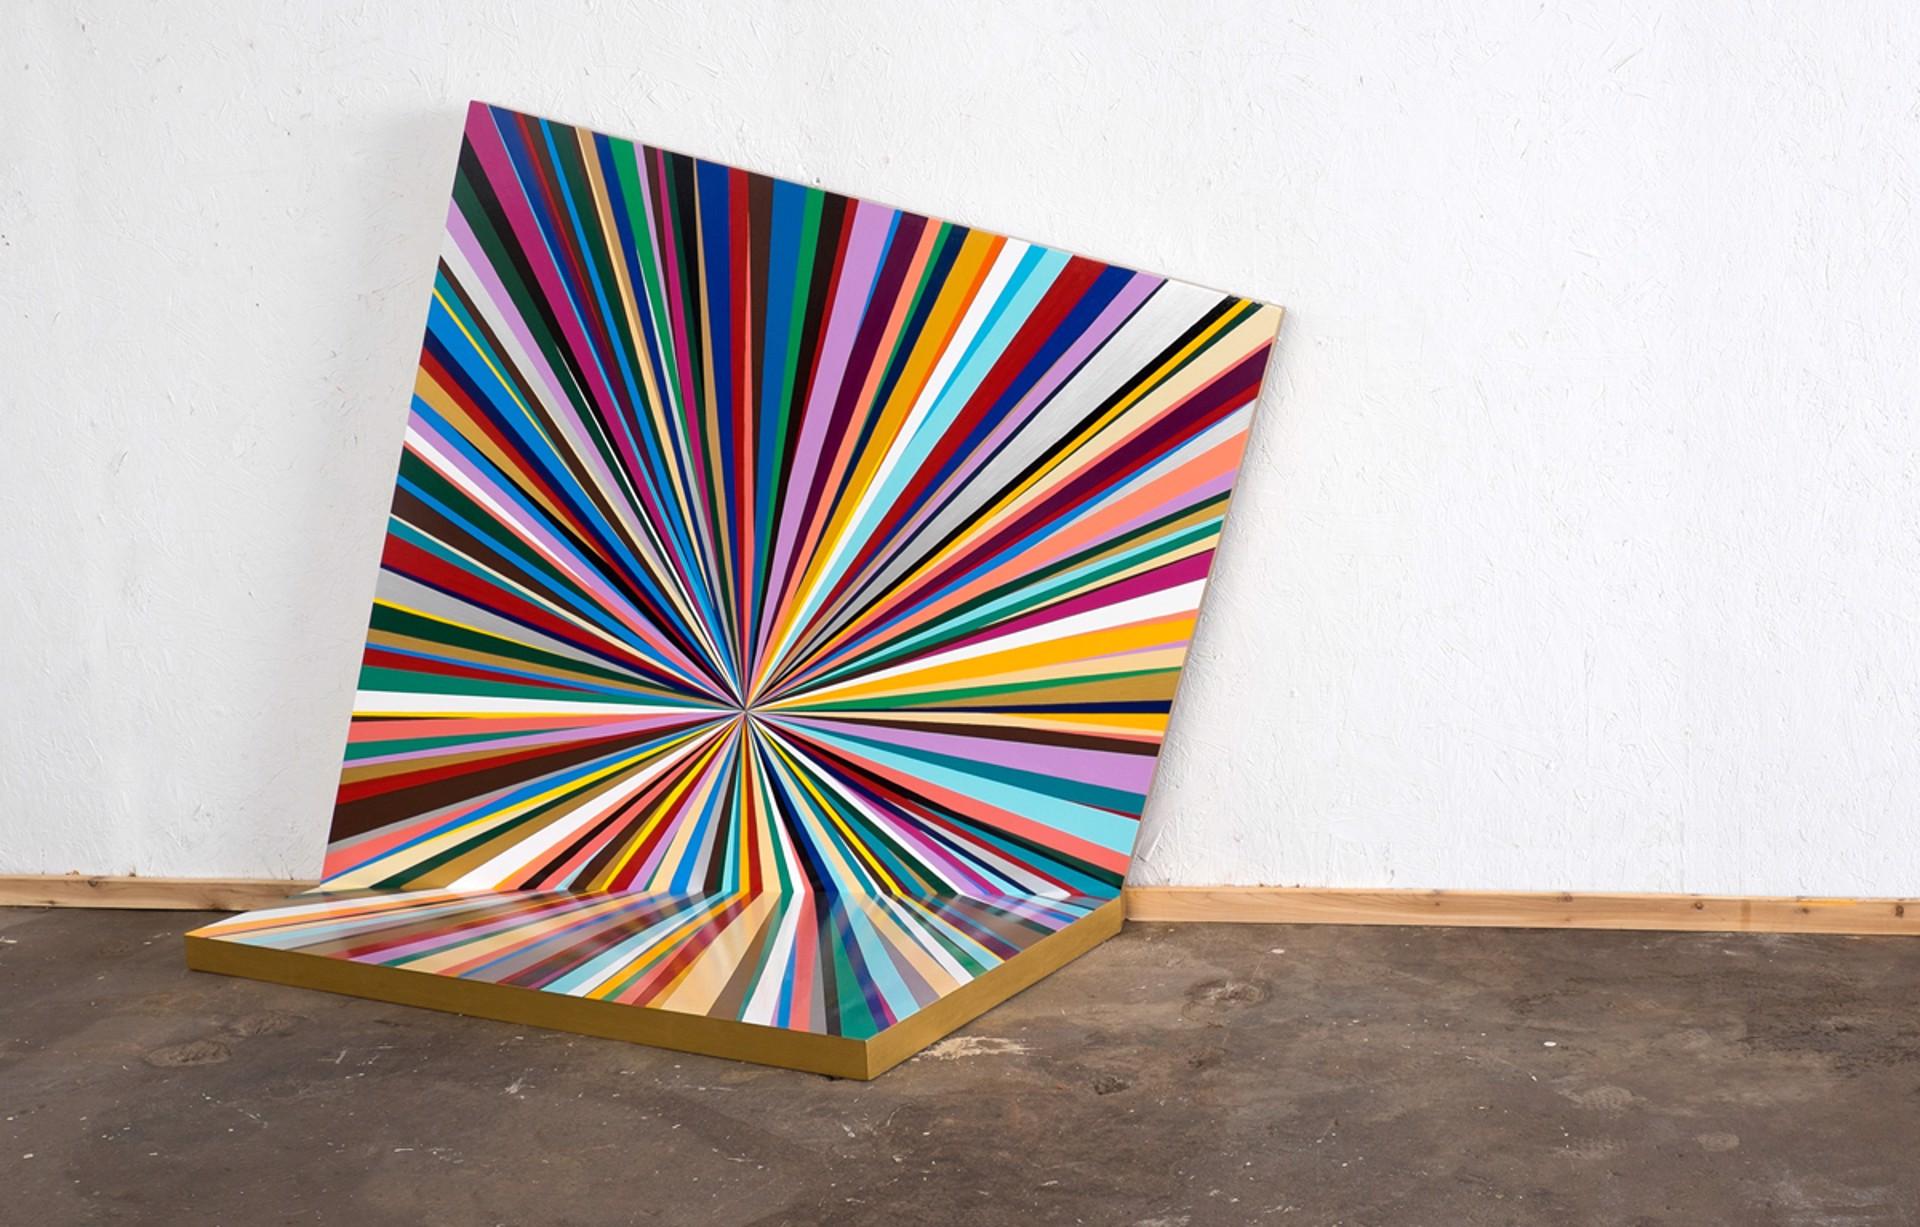 Rabbit Hole by Gibbs Rounsavall